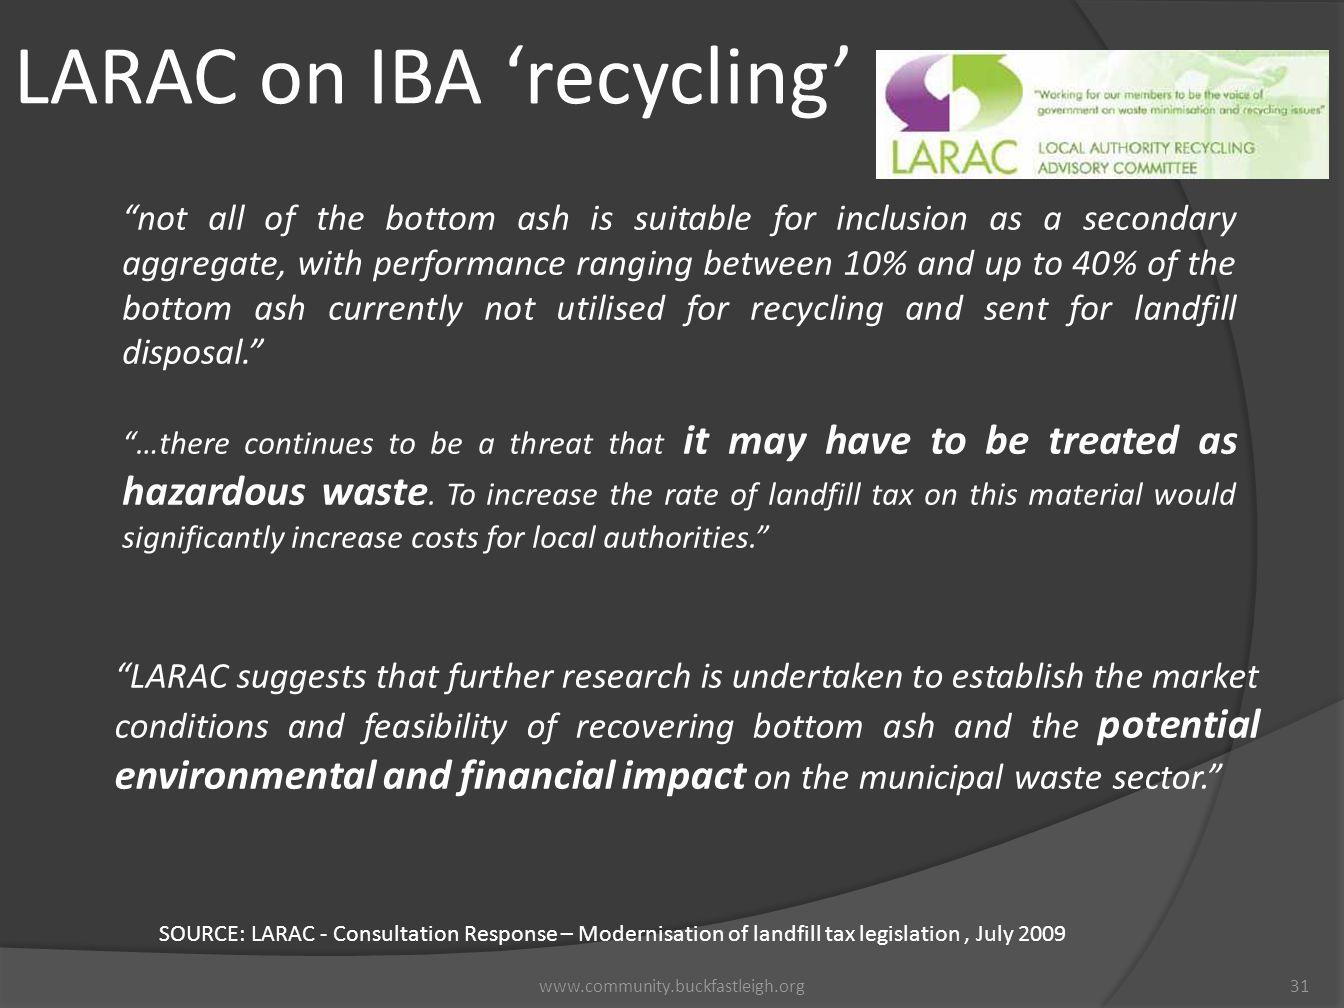 LARAC on IBA 'recycling'